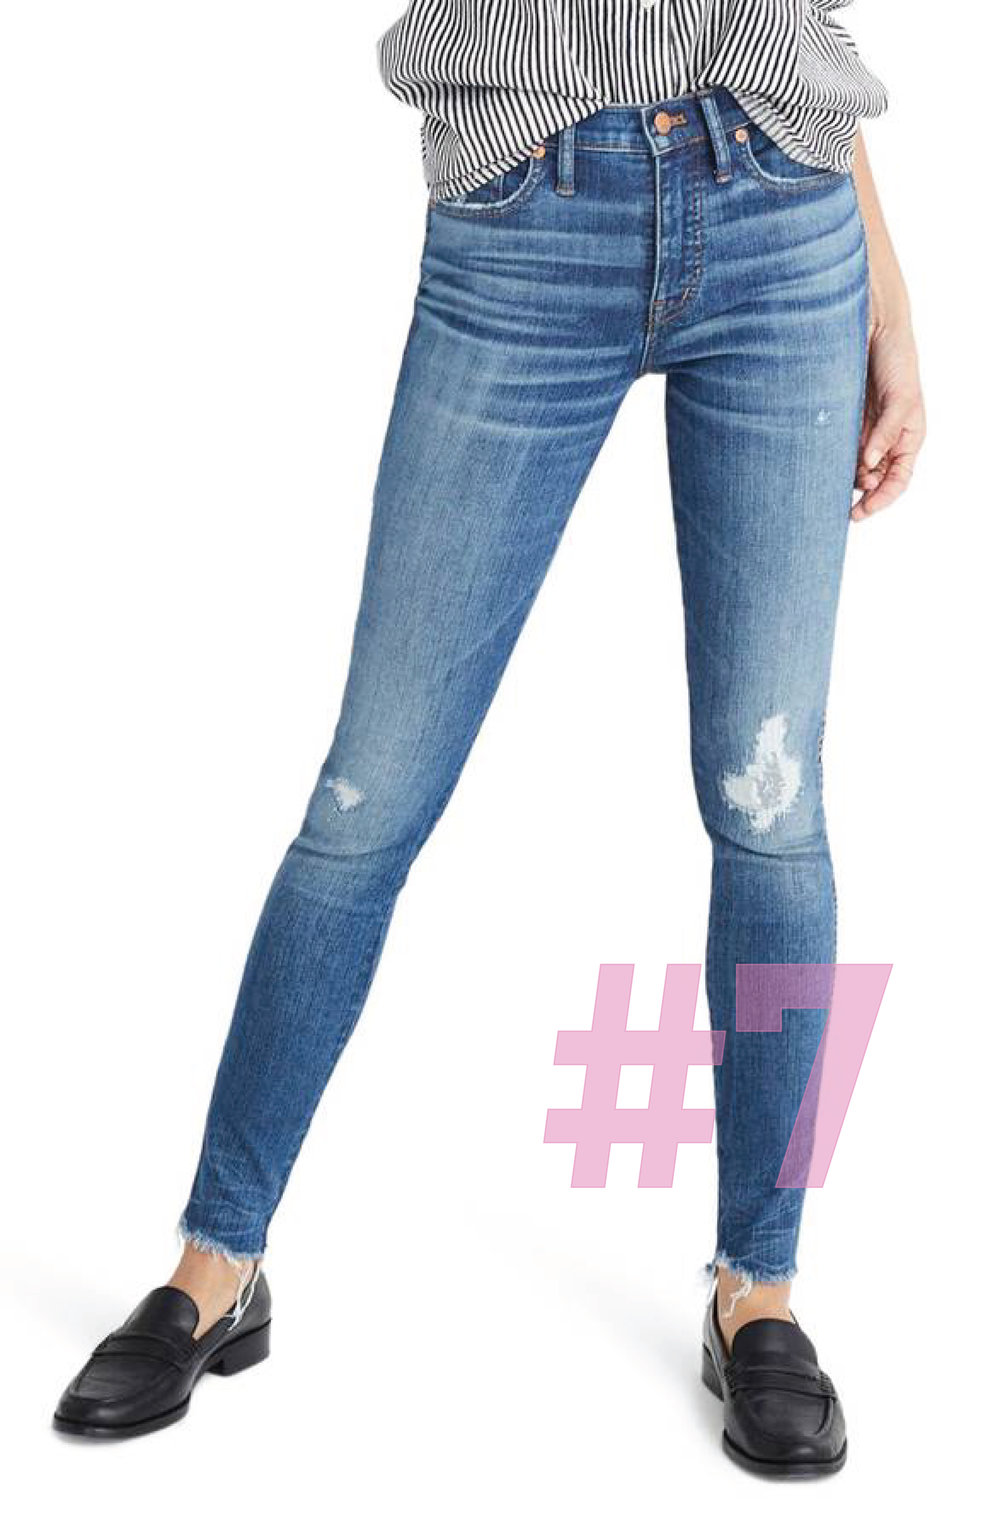 Jeans-7.jpg